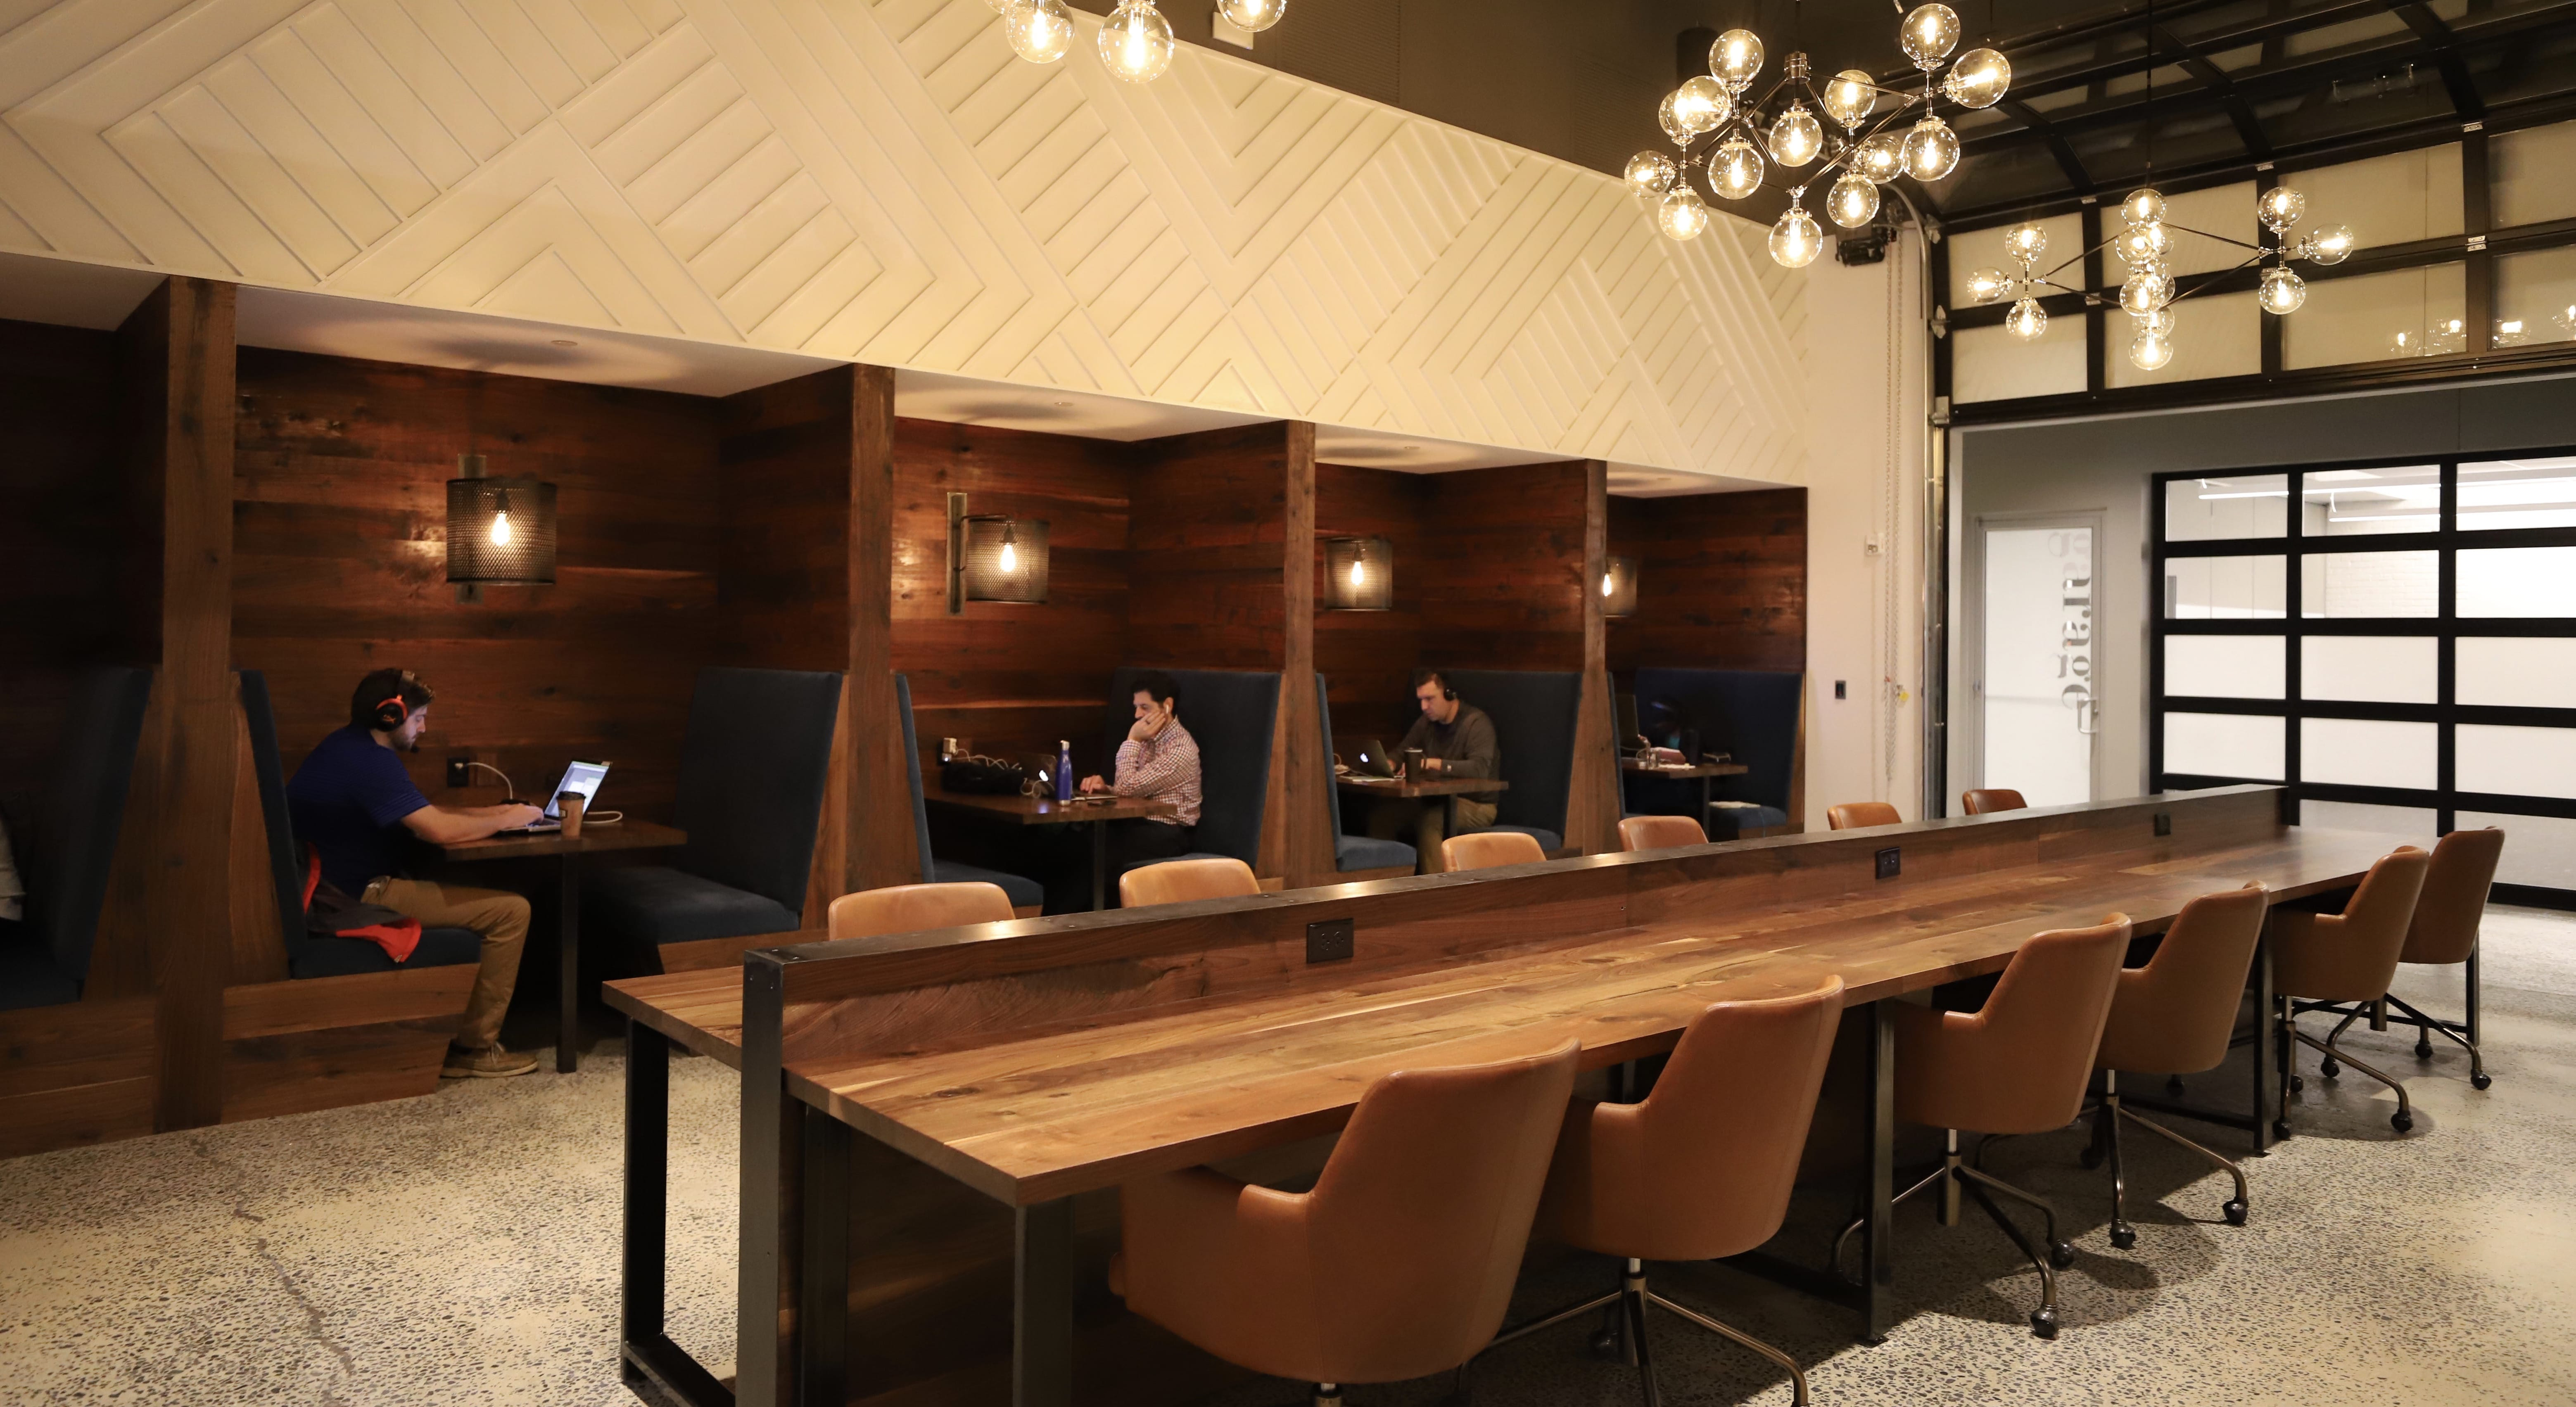 Atlanta Shared Office Space Locations- Roam Innovative Workplace